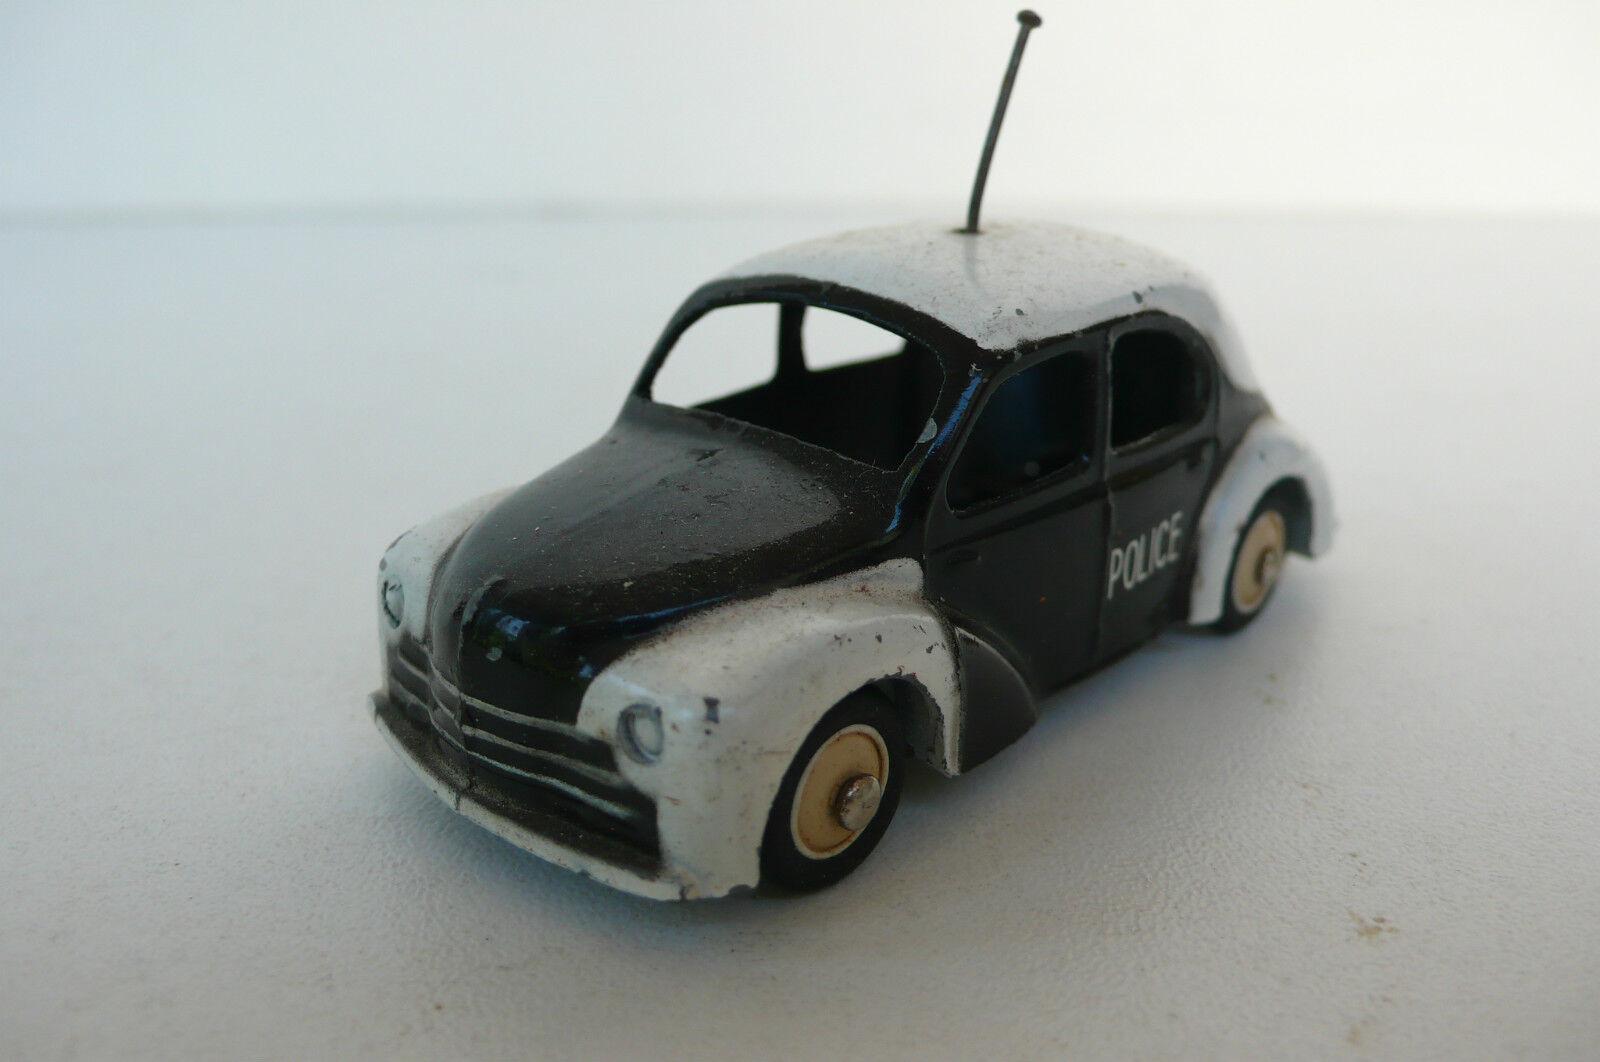 CIJ   RENAULT 4 CV  POLICE  BON ÉTAT     1956  REF 3.49  1er TYPE